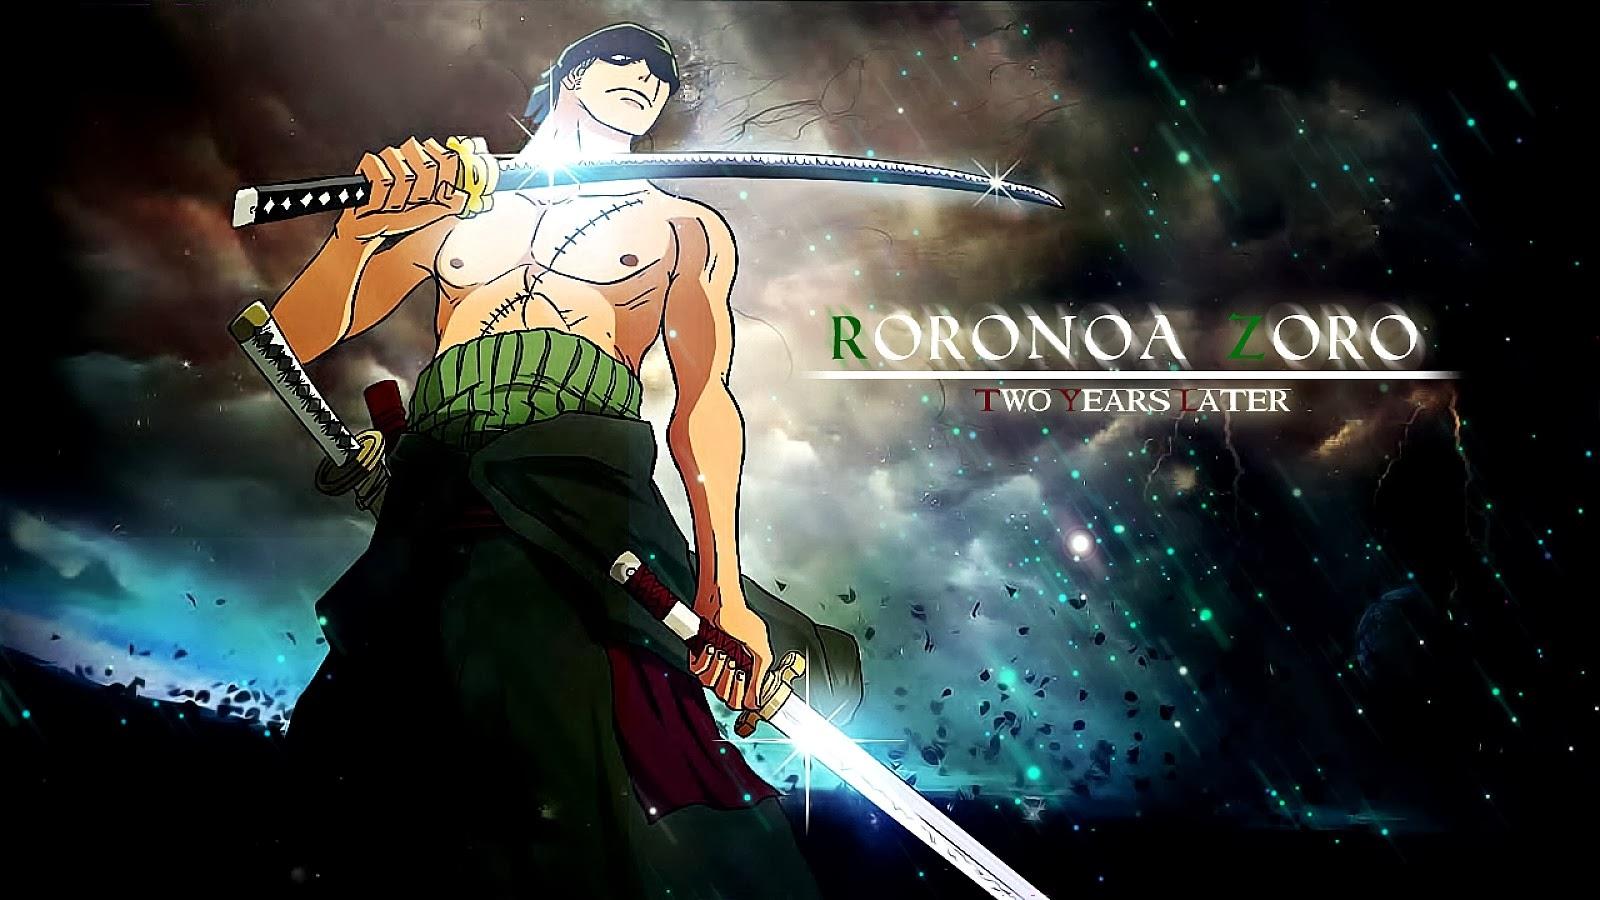 Download Roronoa Zoro Wallpapers Full Hd Download One Piece Zoro Attack 1600x900 Download Hd Wallpaper Wallpapertip